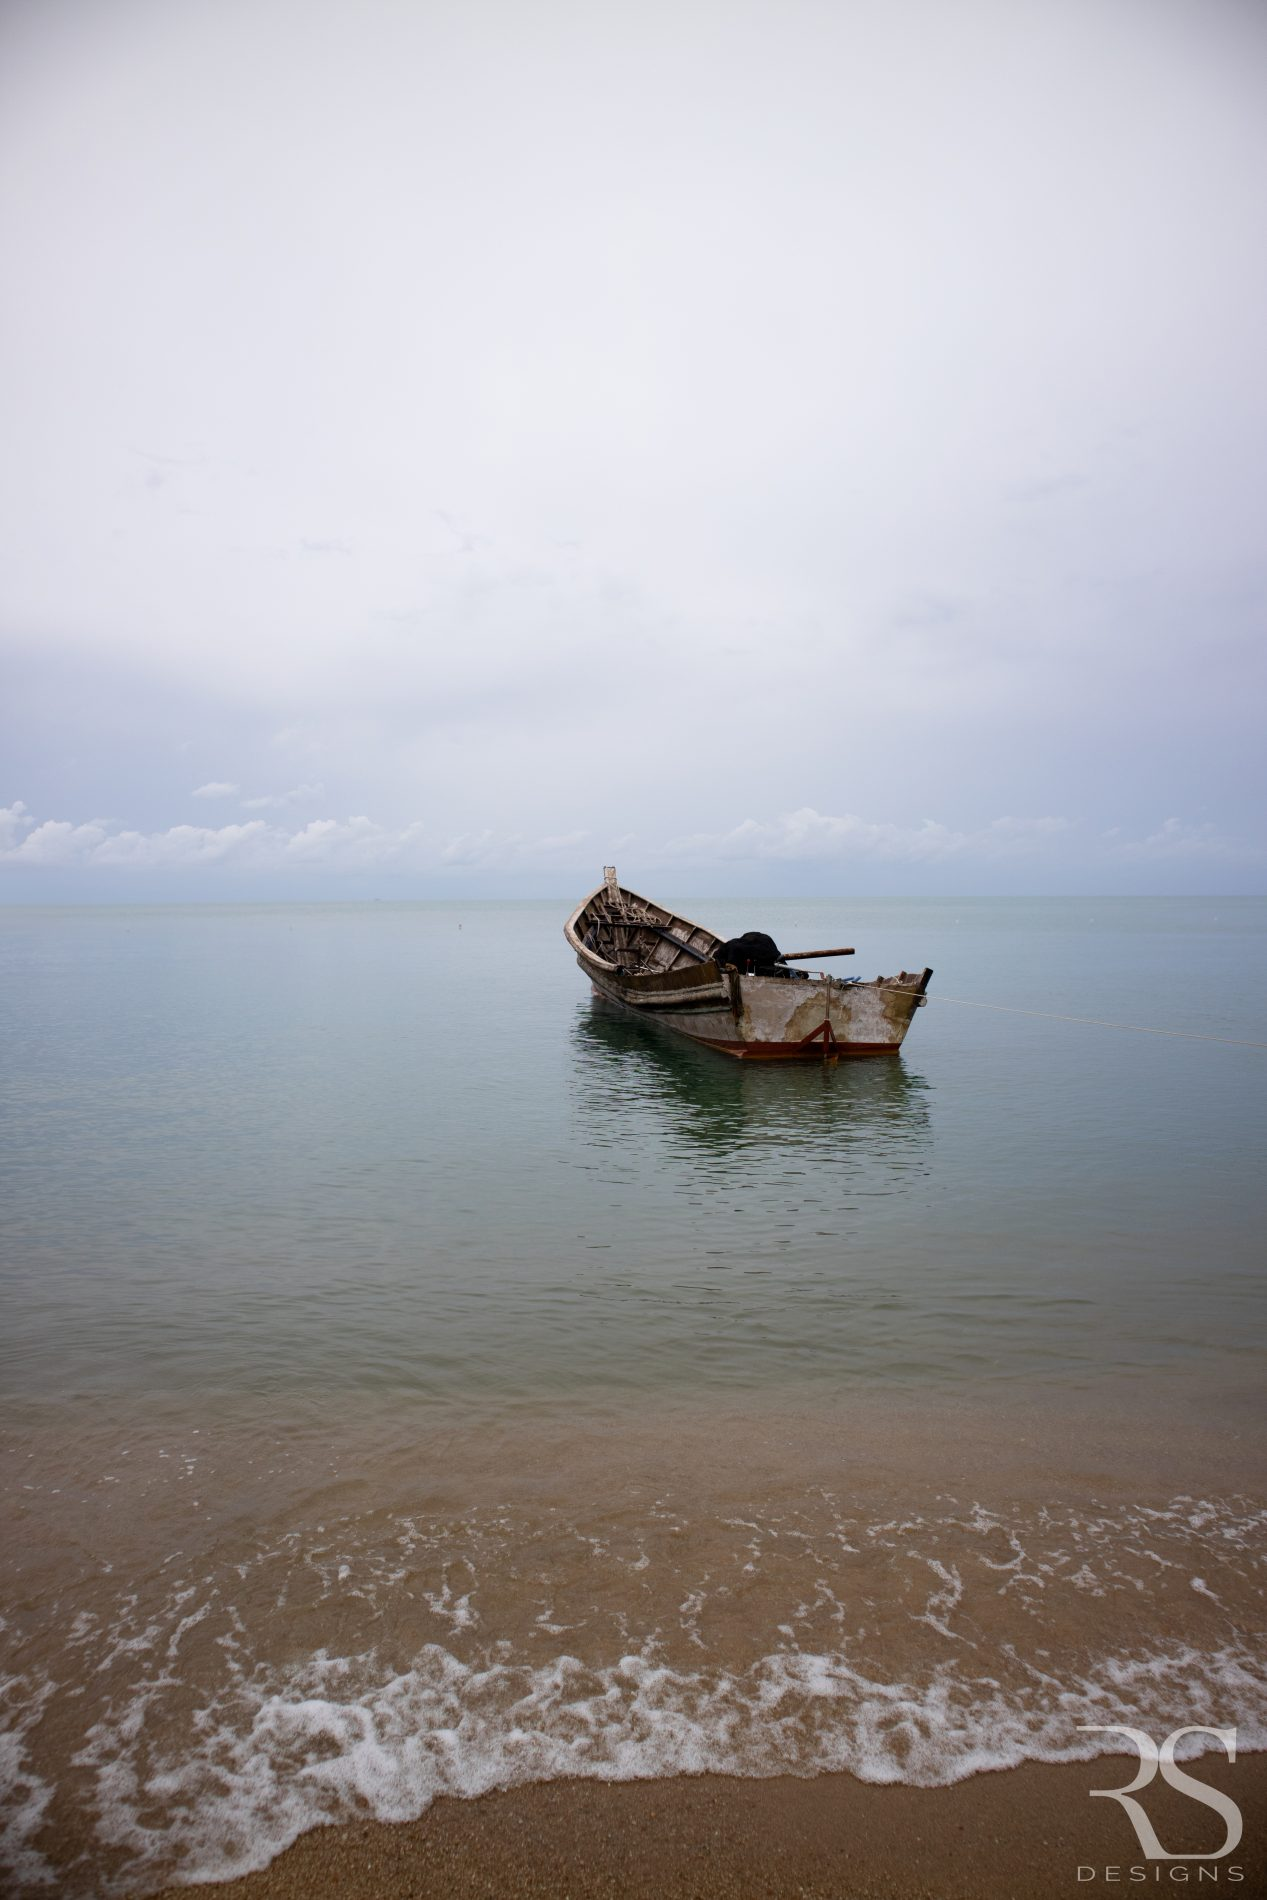 koh phangan thailand travel video videografie fotografie - RSDesigns